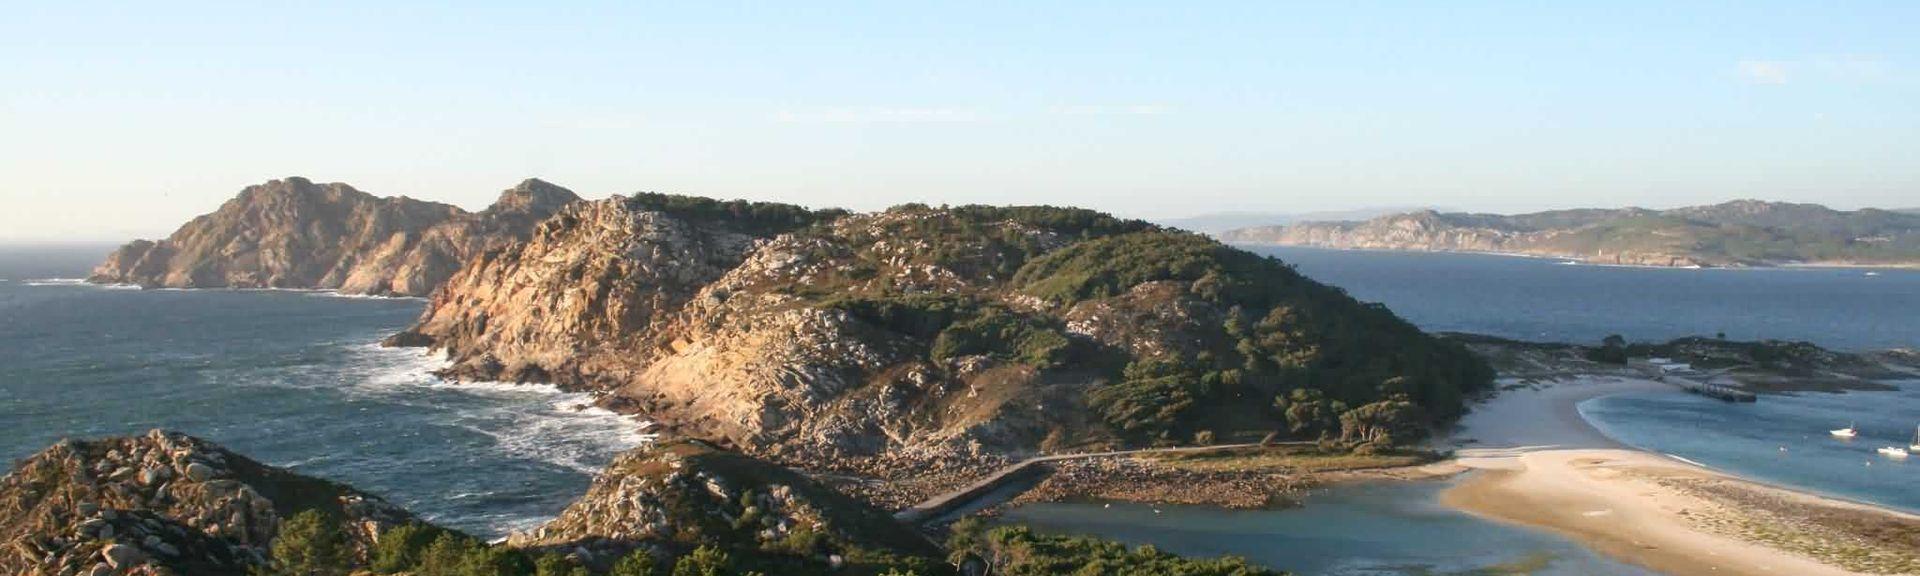 Plage de Silgar, Sanxenxo, Galice, Espagne